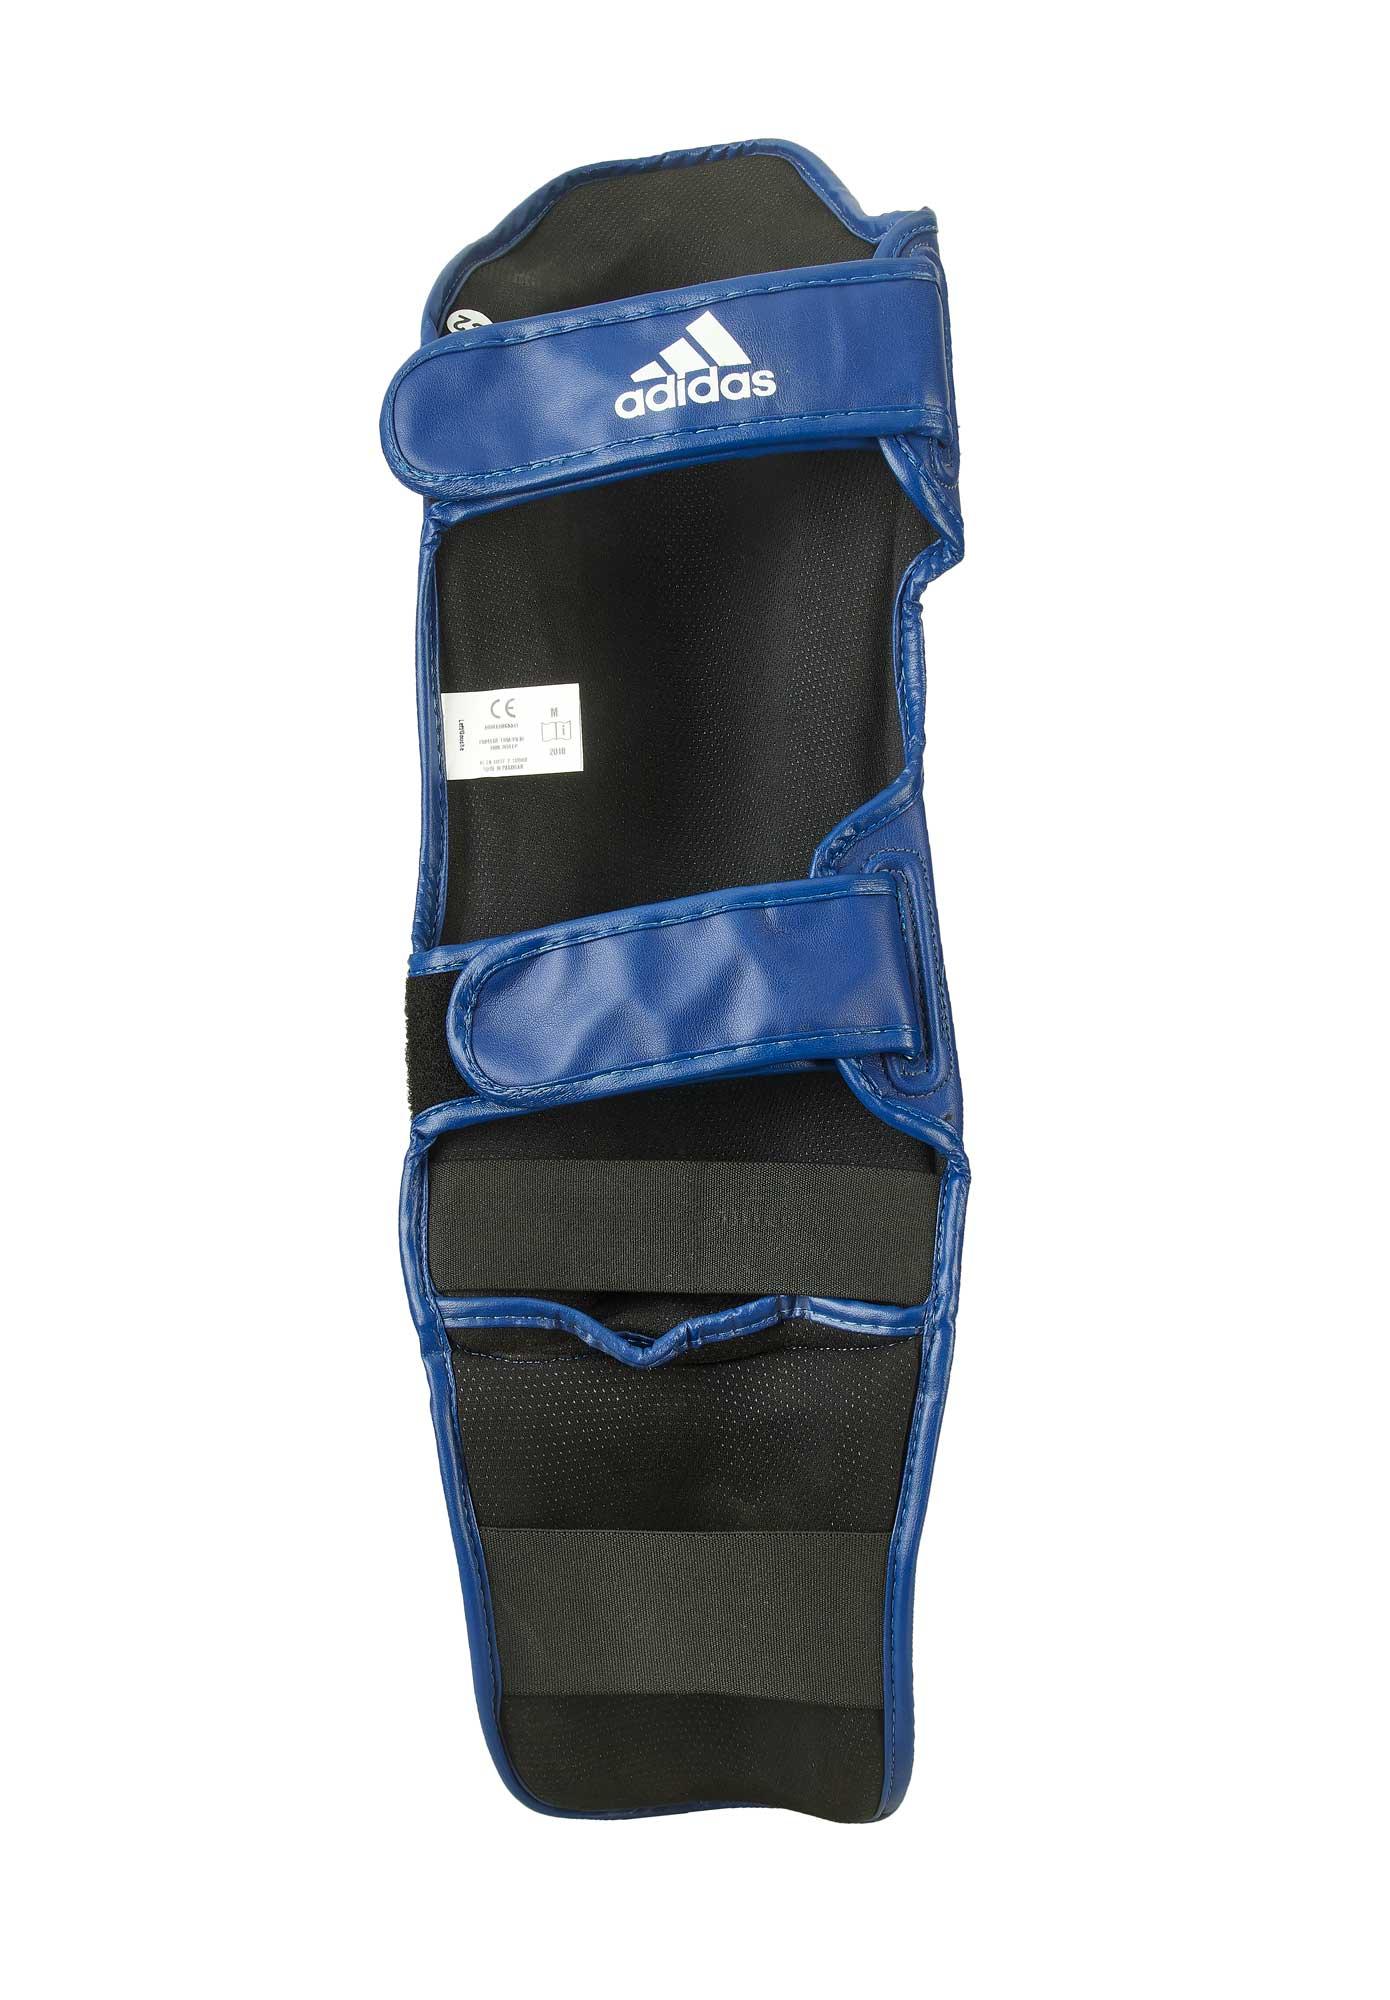 adidas Super Pro Shin n Step blue, WAKO, ADIWAKOGSS11